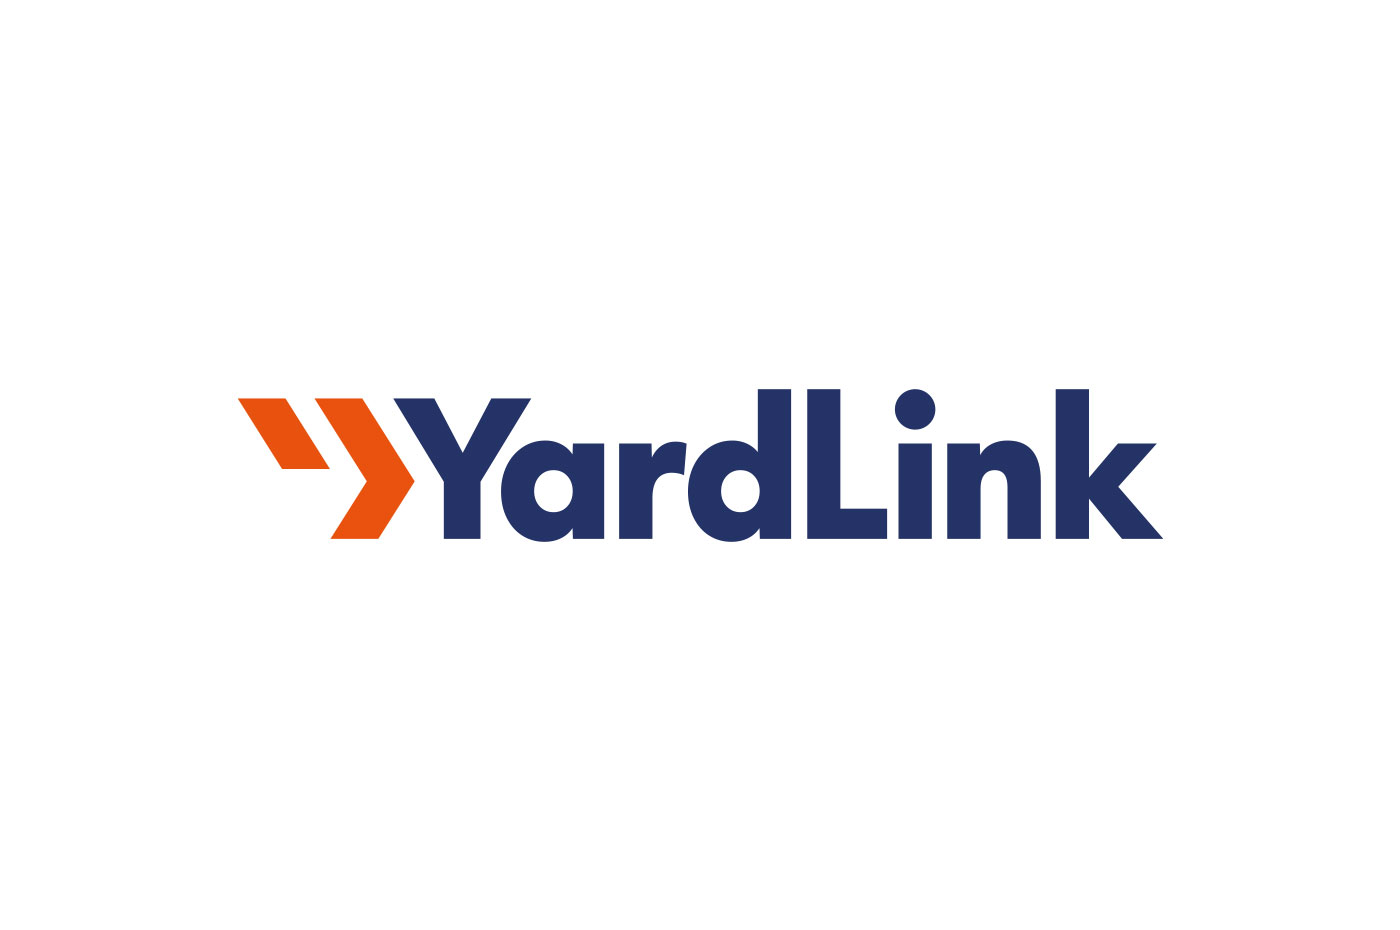 YardLink